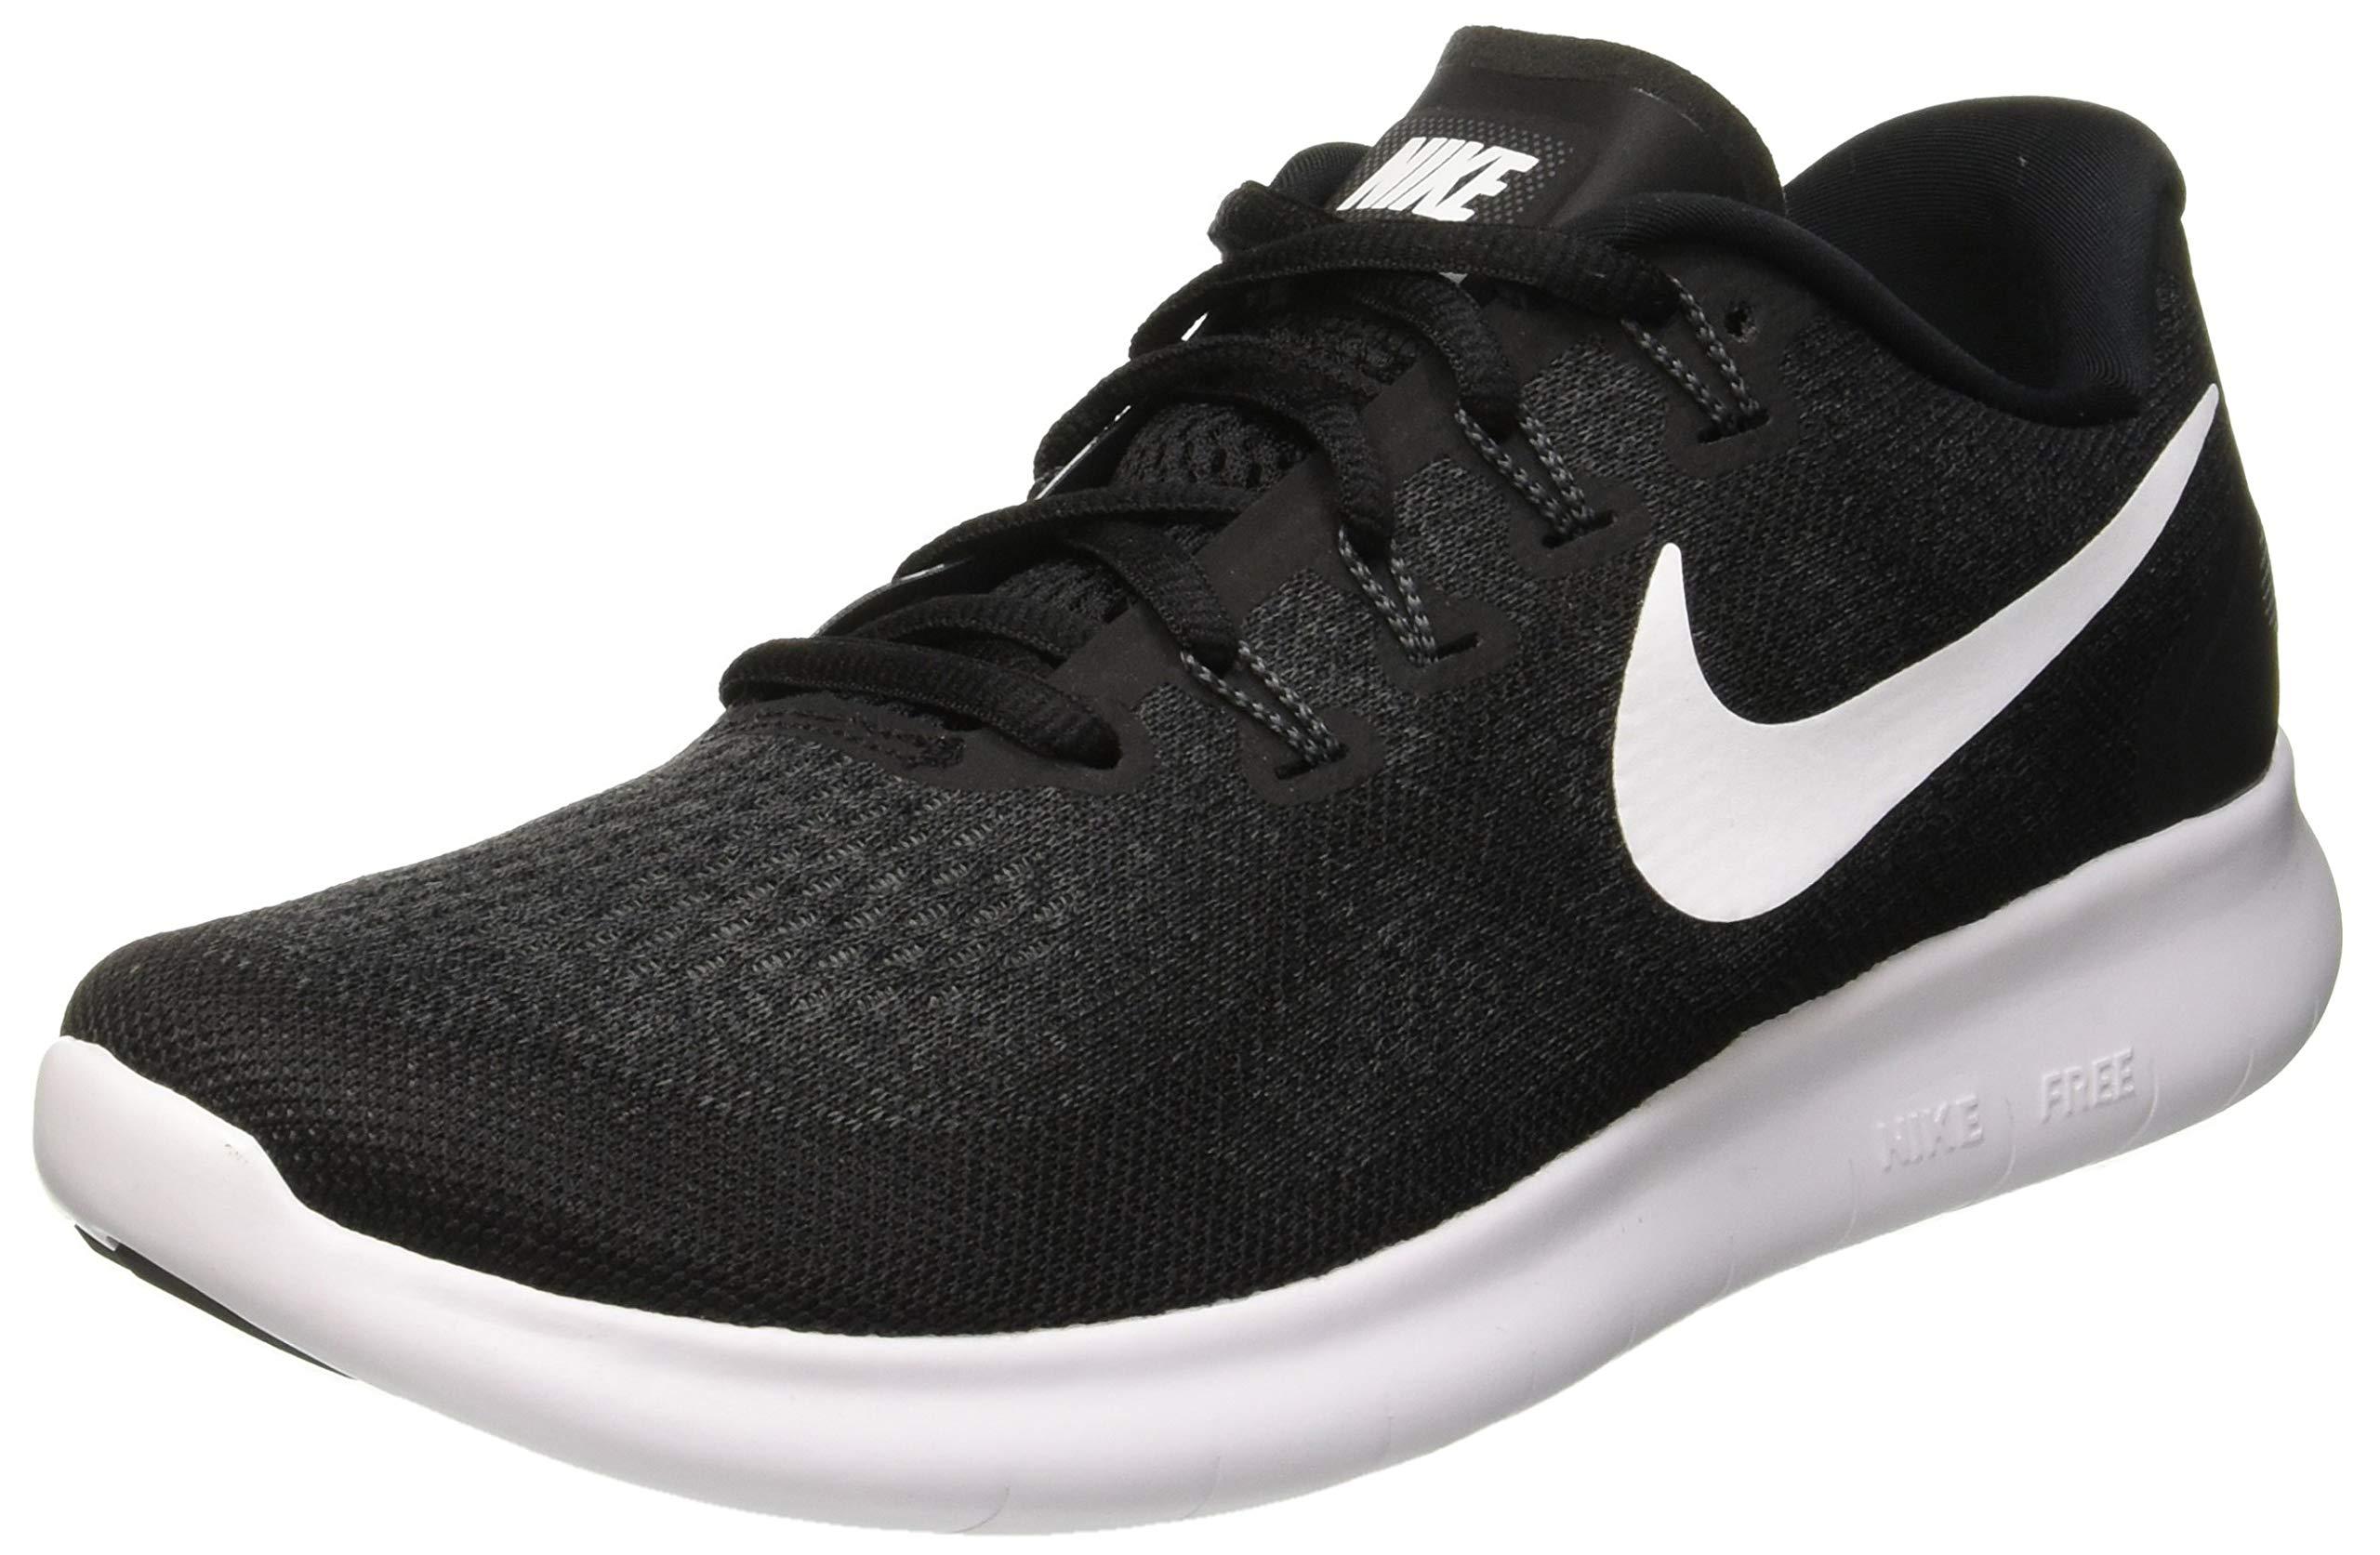 Nike Free RN 2017 Black/White/Dark Grey/Anthracite Womens Running Shoes